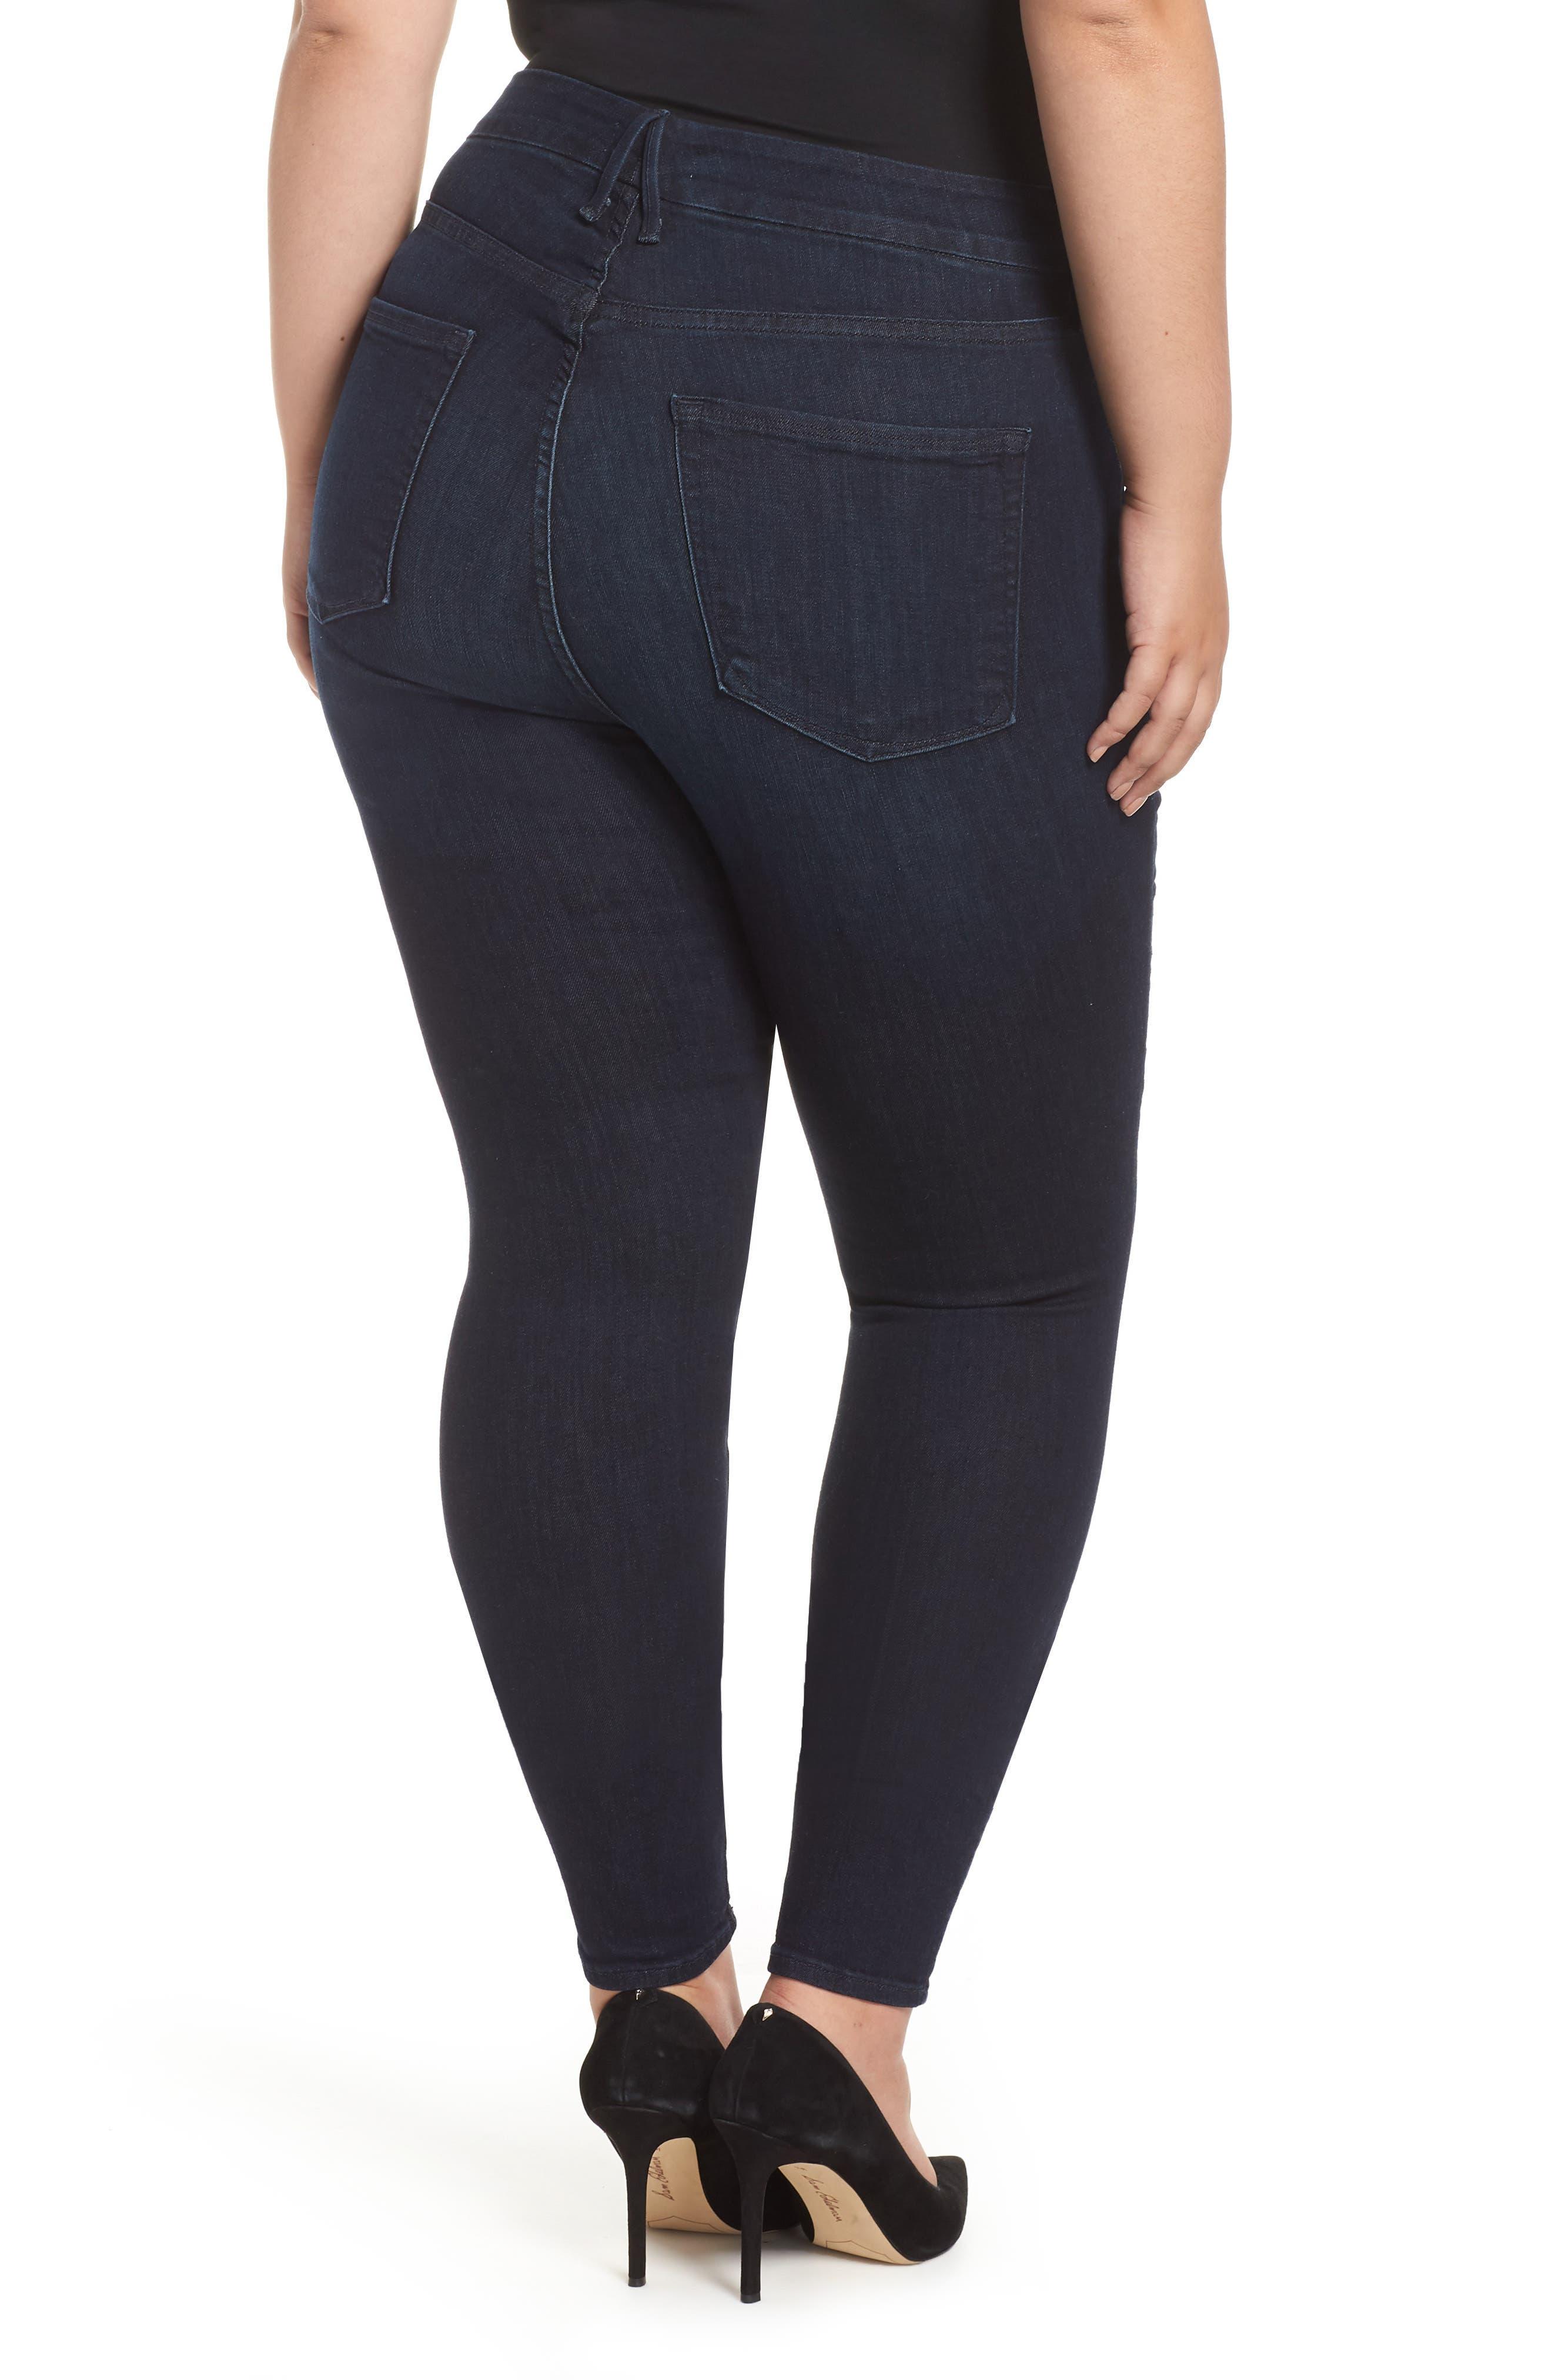 GOOD AMERICAN,                             Good Legs High Waist Skinny Jeans,                             Alternate thumbnail 9, color,                             BLUE224